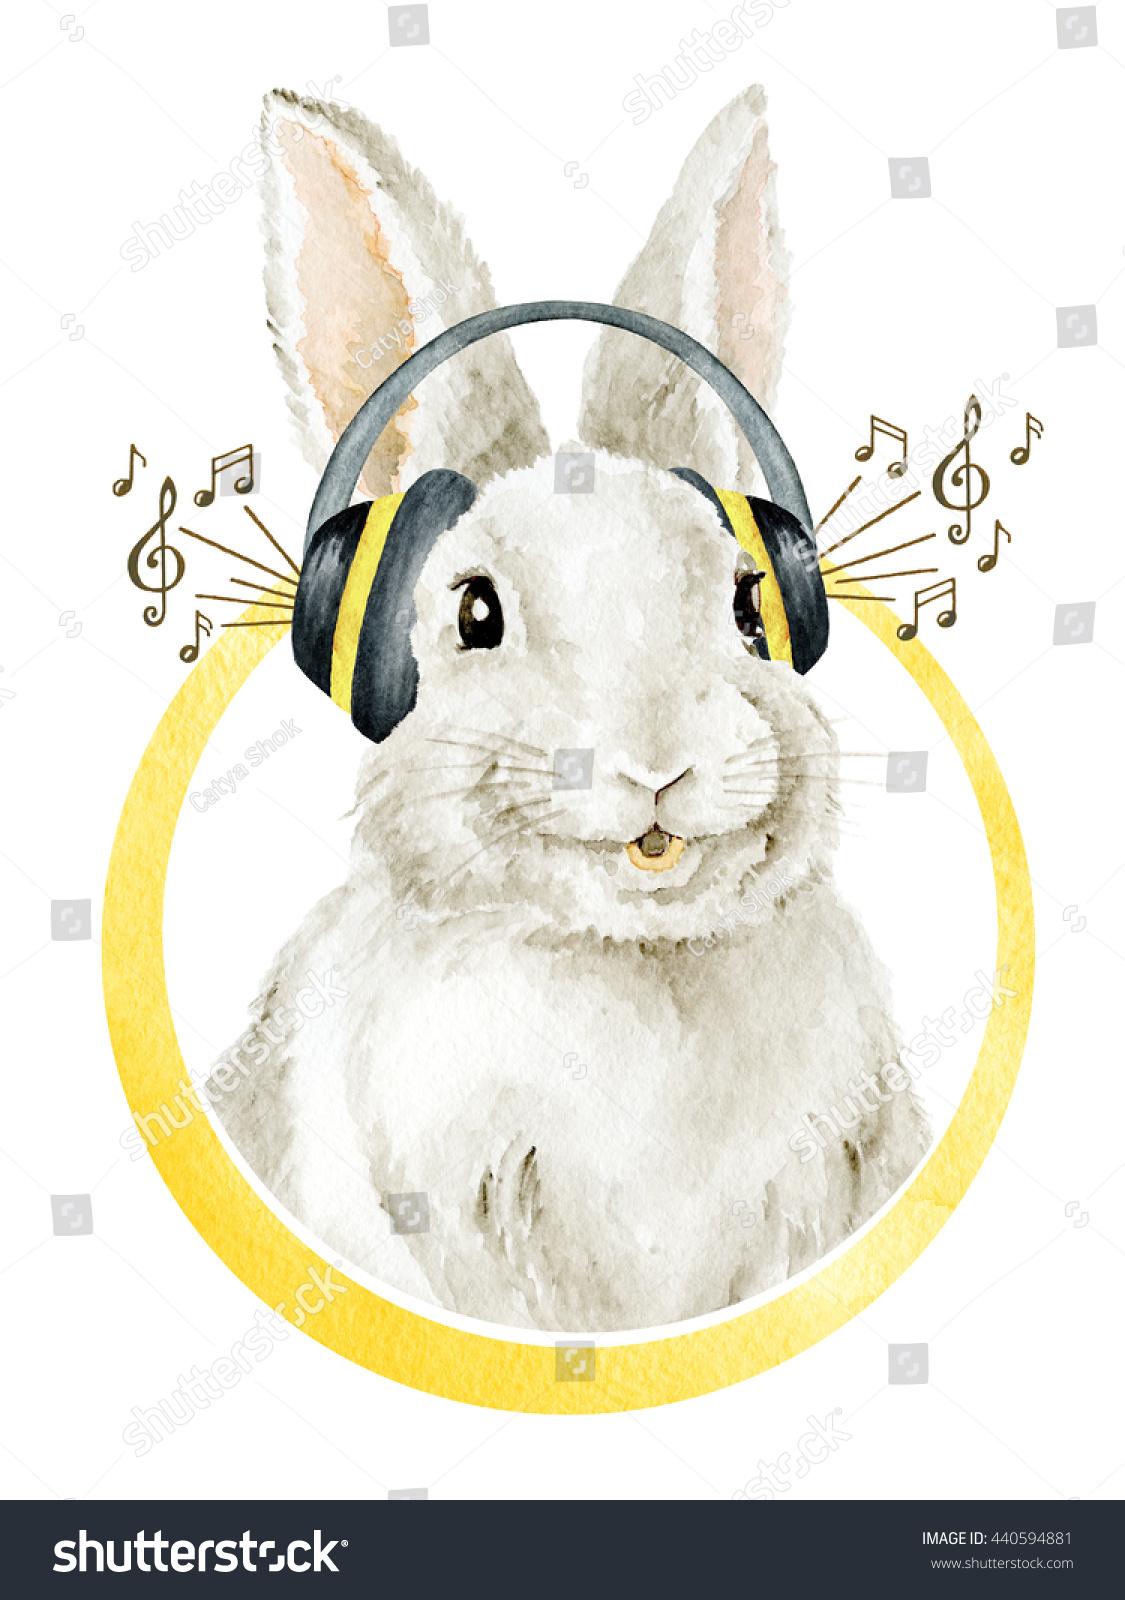 Cool Funny Smiling Bunny Farm Animals Stock Illustration 440594881 ...